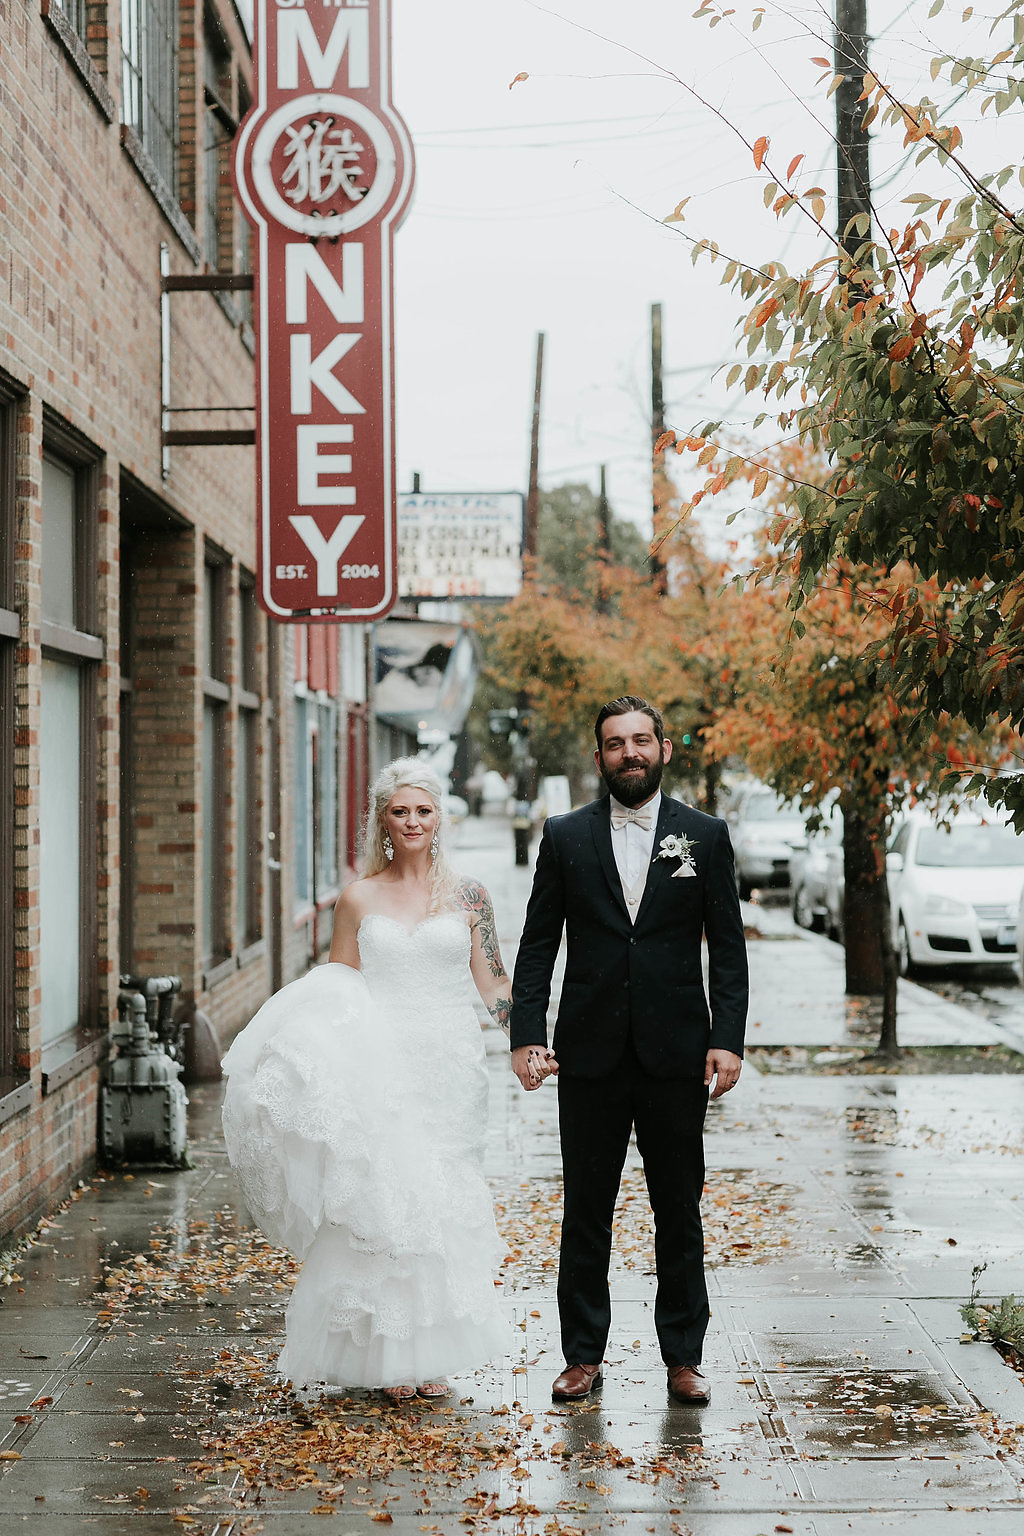 The_Big_Fake_wedding_Seattle_Within_sodo_wedding_by_Adina_Preston_Weddings_112.JPG